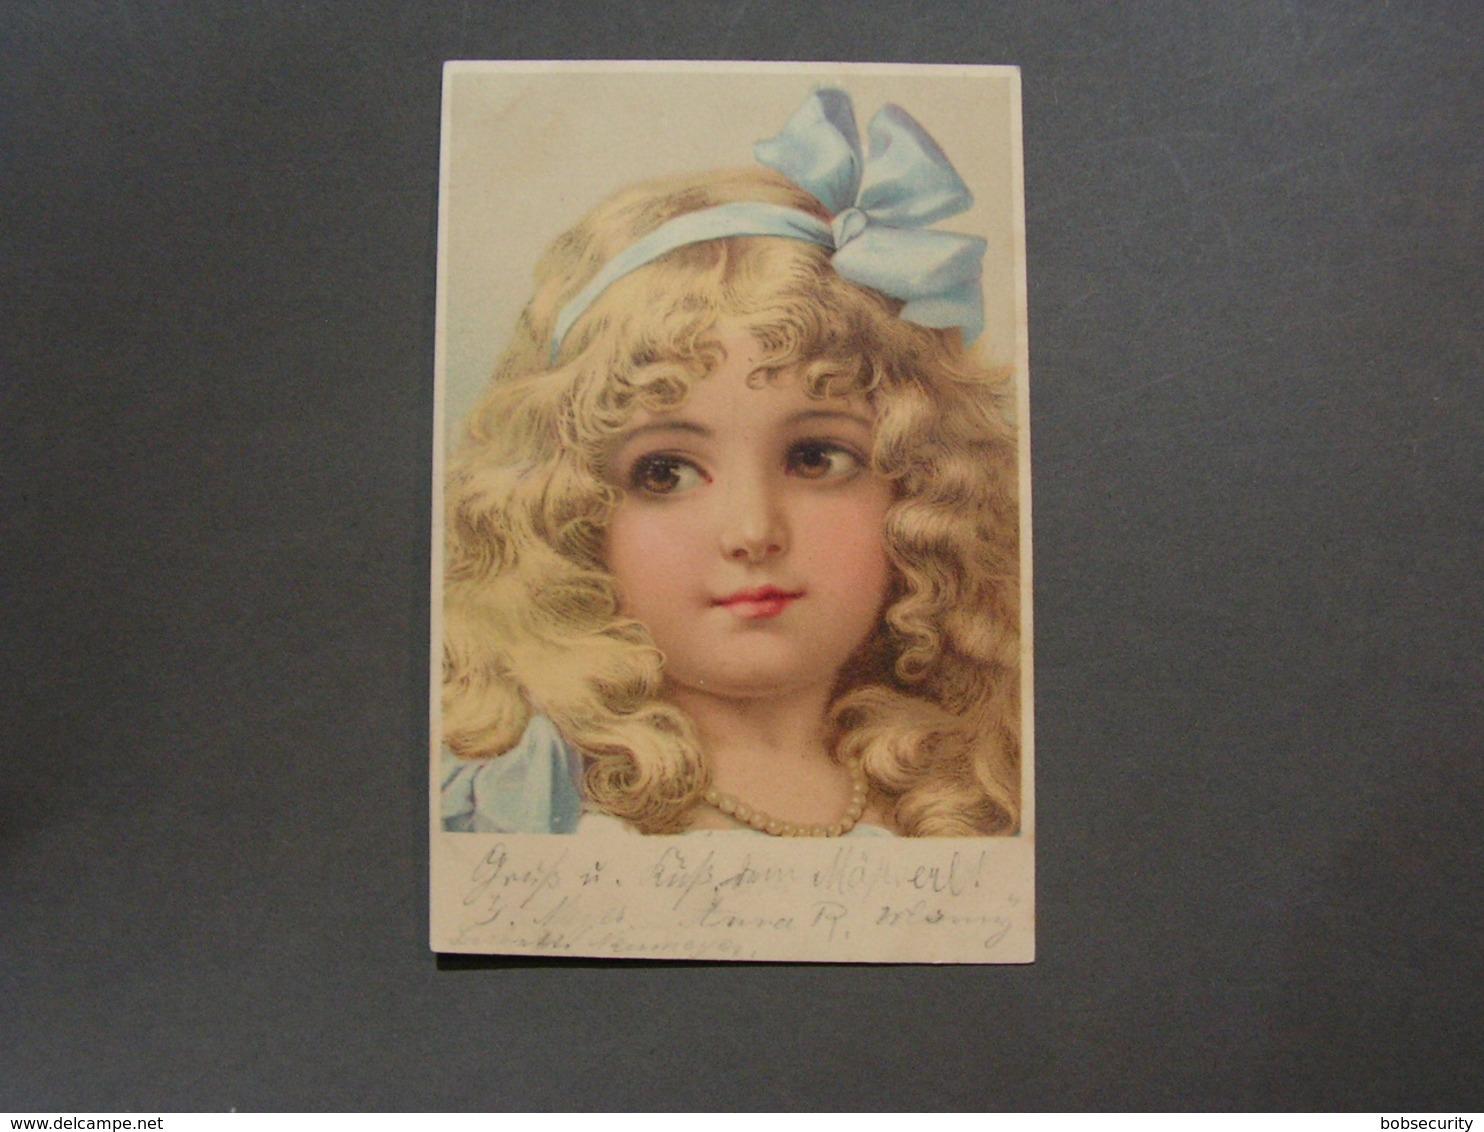 Kind Künstler AK 1903 - Abbildungen